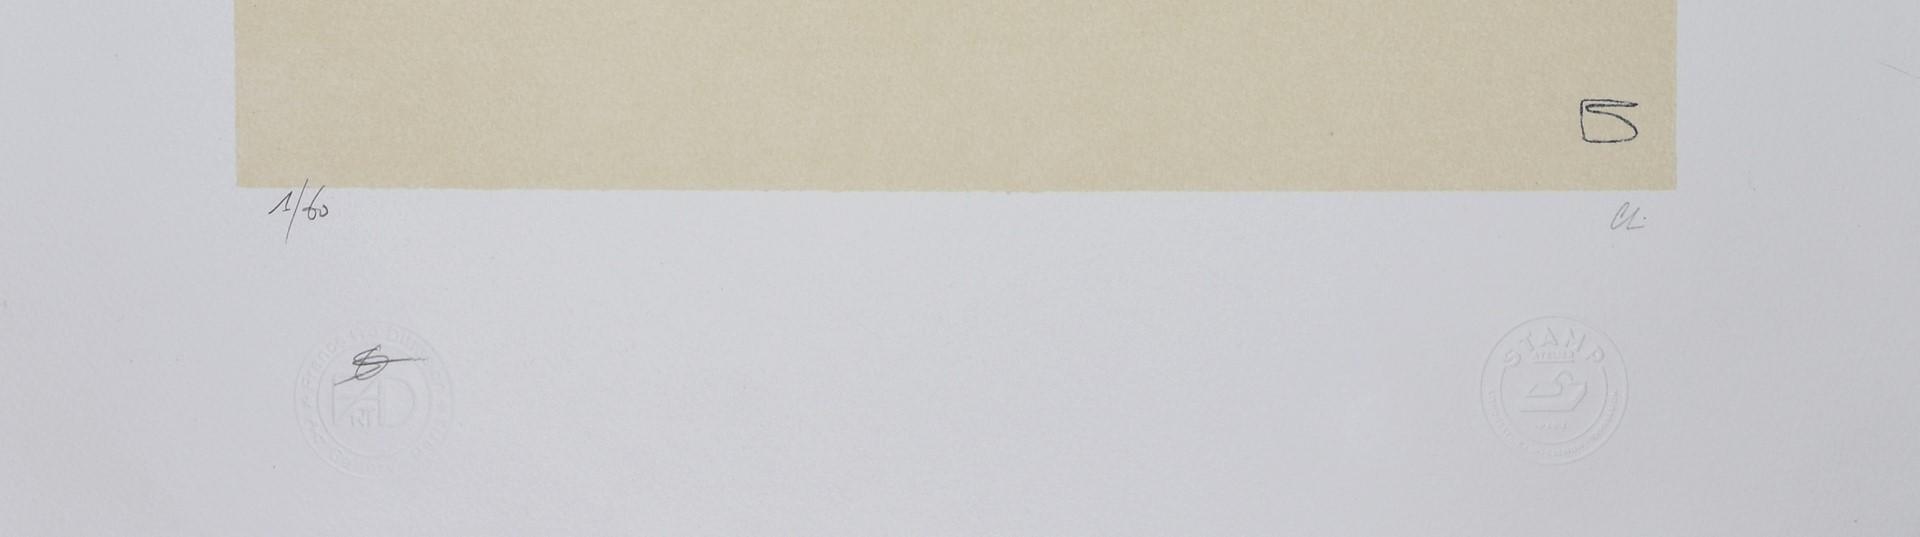 EGON SCHIELE, Lovers 1909, Lithograph